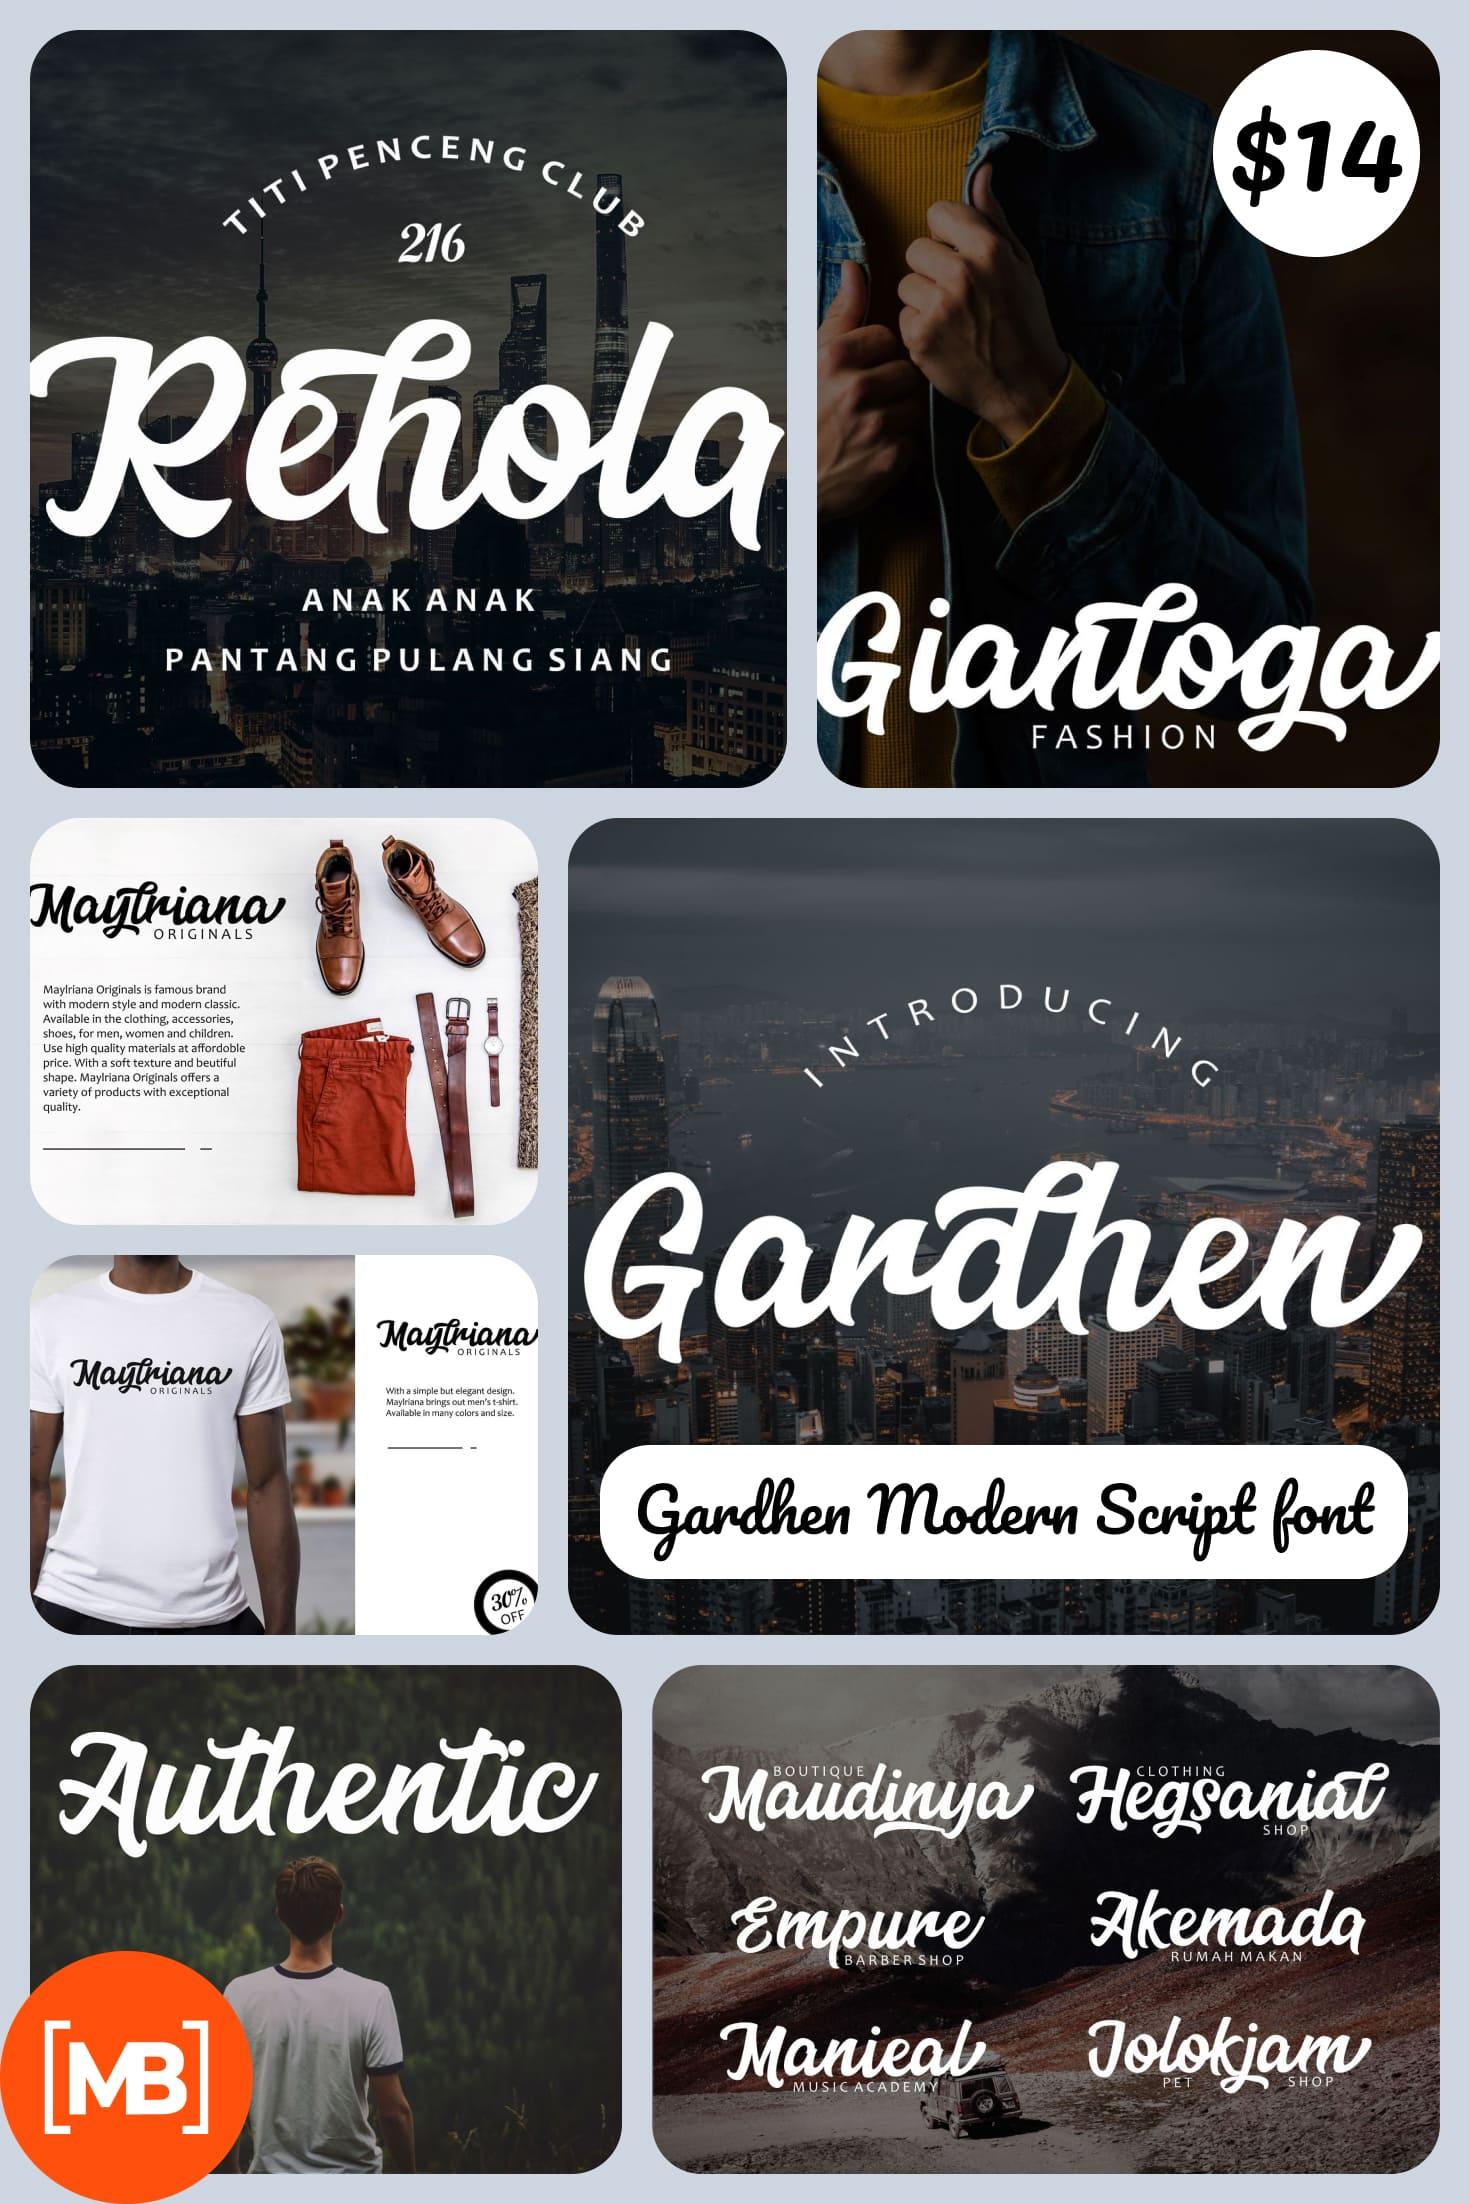 Gardhen Modern Script font - $14. Collage Image.